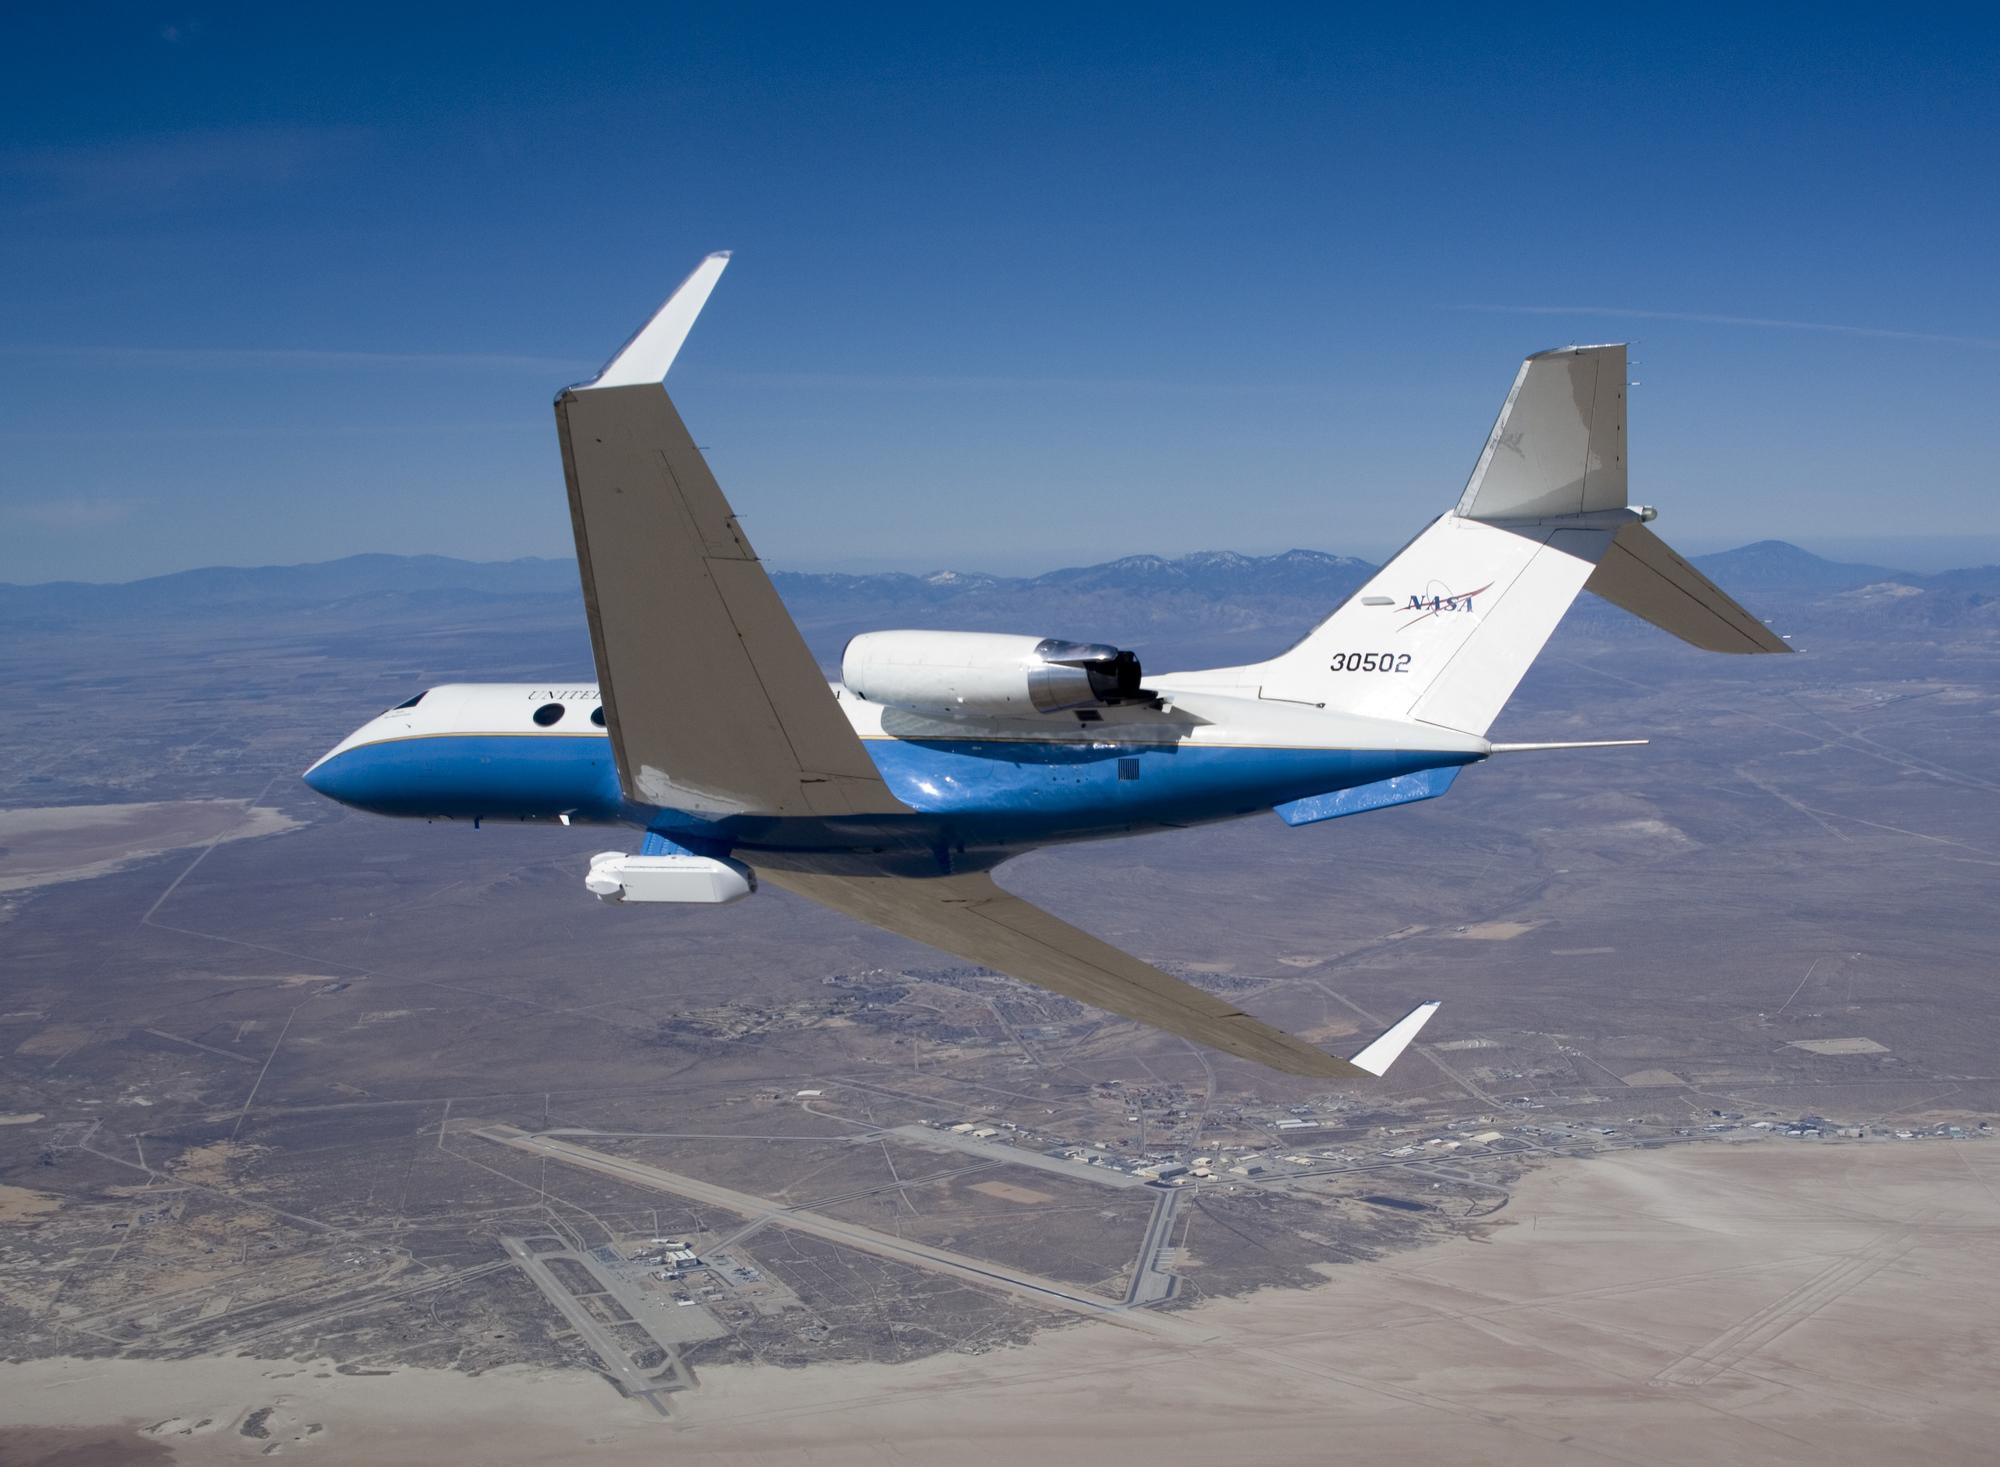 2/illustrations/rr_spey/NASA_83-0502_with_UAVSAR_at_Edwards_AFB_(ED07-0042-09).jpg